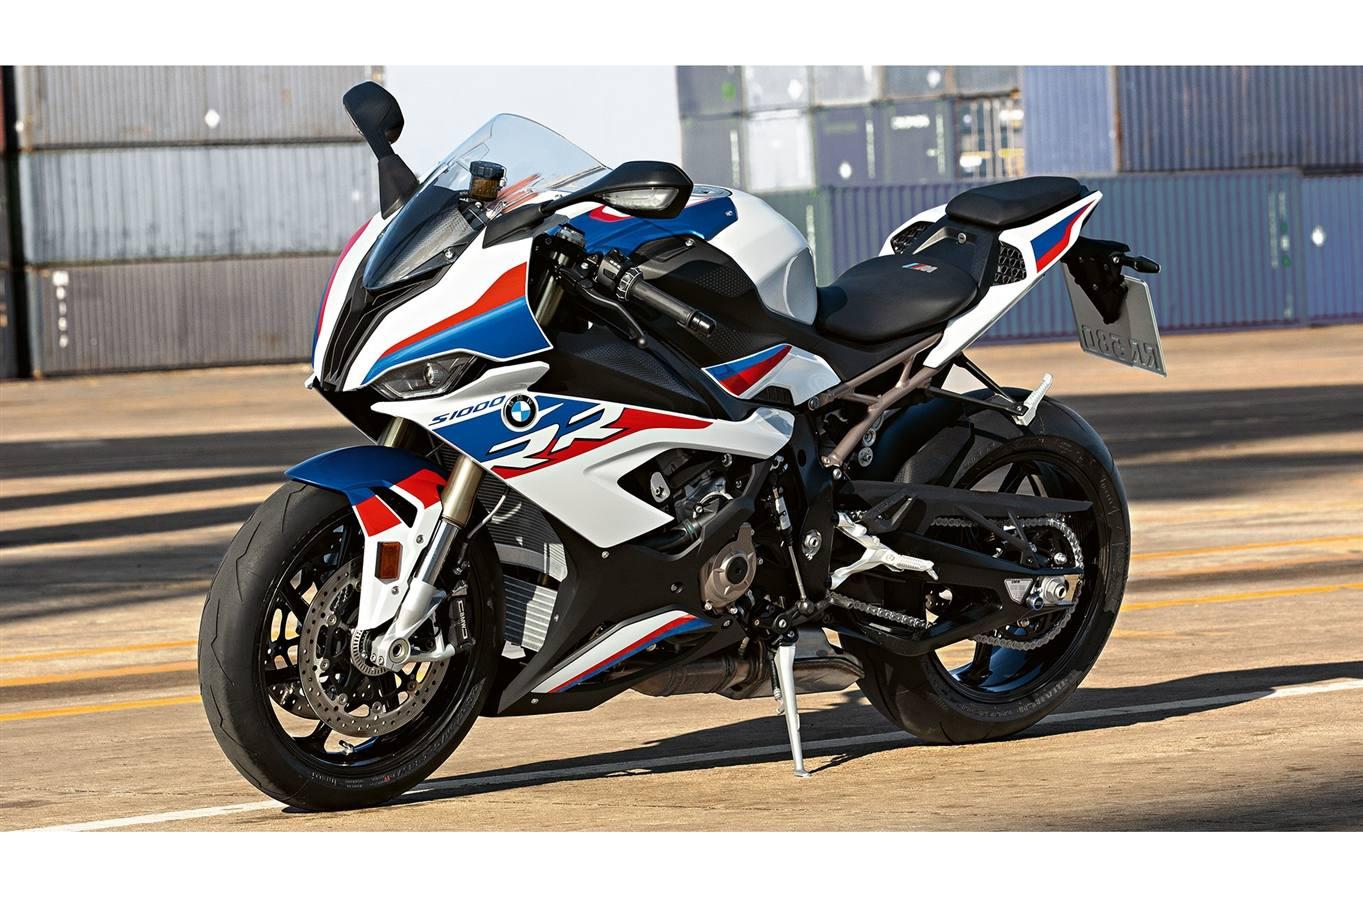 2020 Bmw S1000rr For Sale In Toronto On Maranello Moto Sport Toronto On 416 238 7898